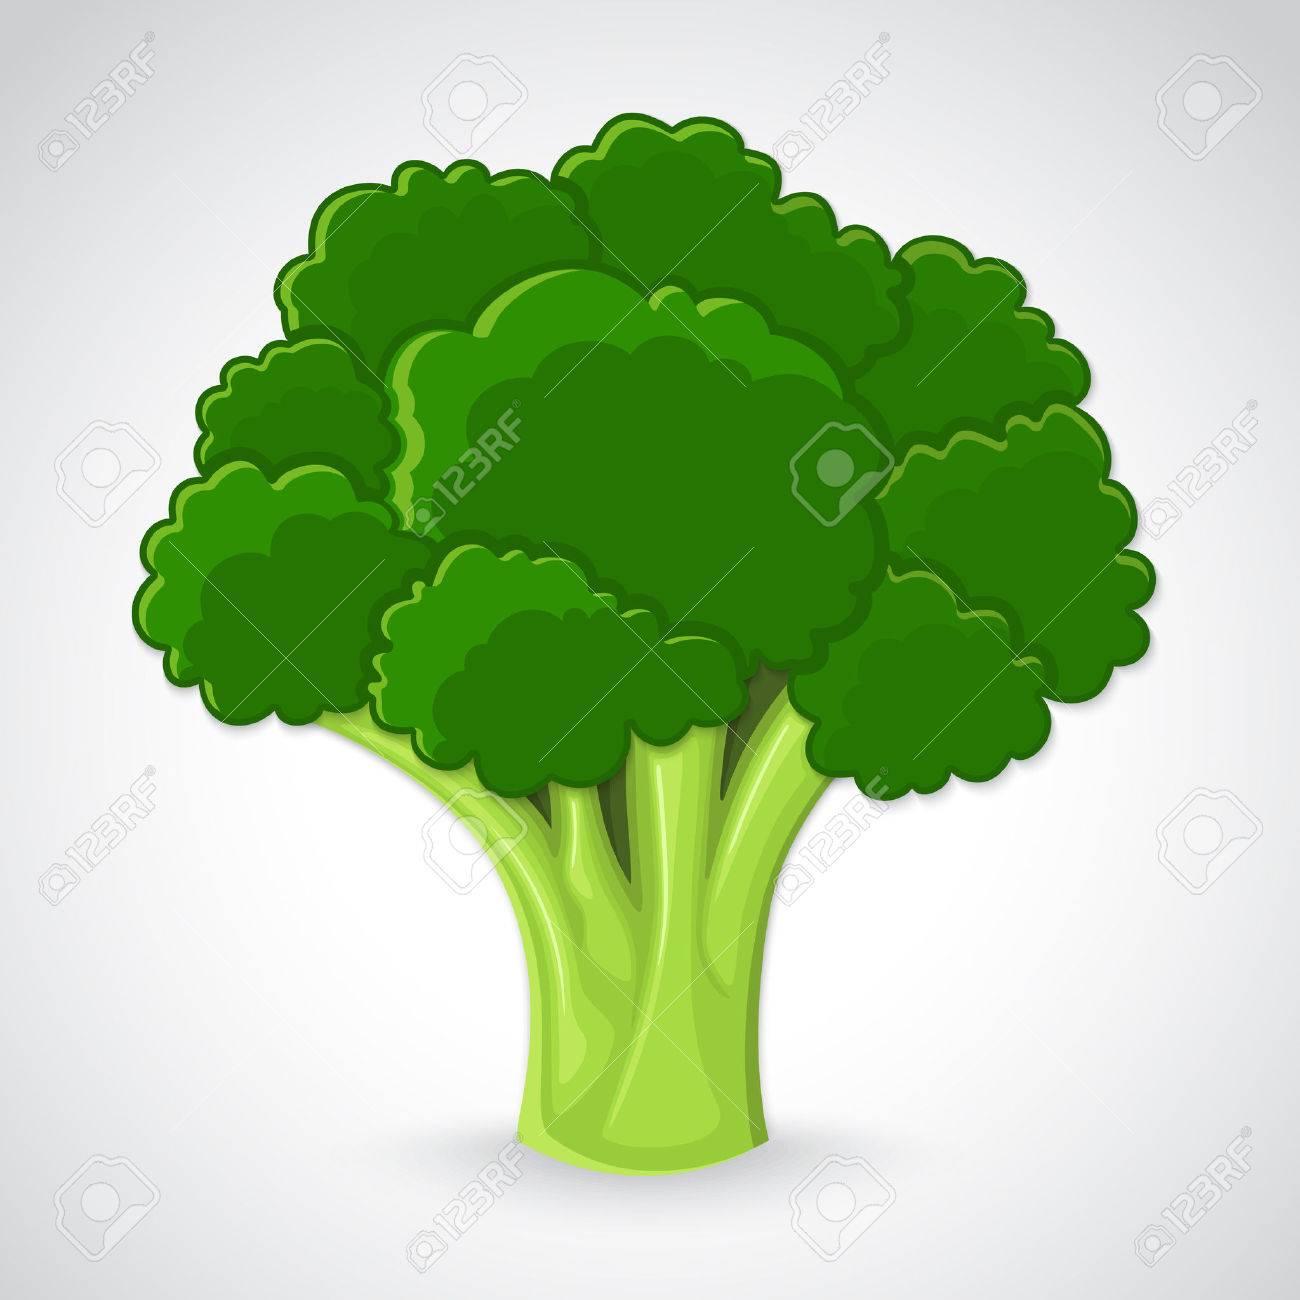 Atristic hand drawn illustration of broccoli - 23268900